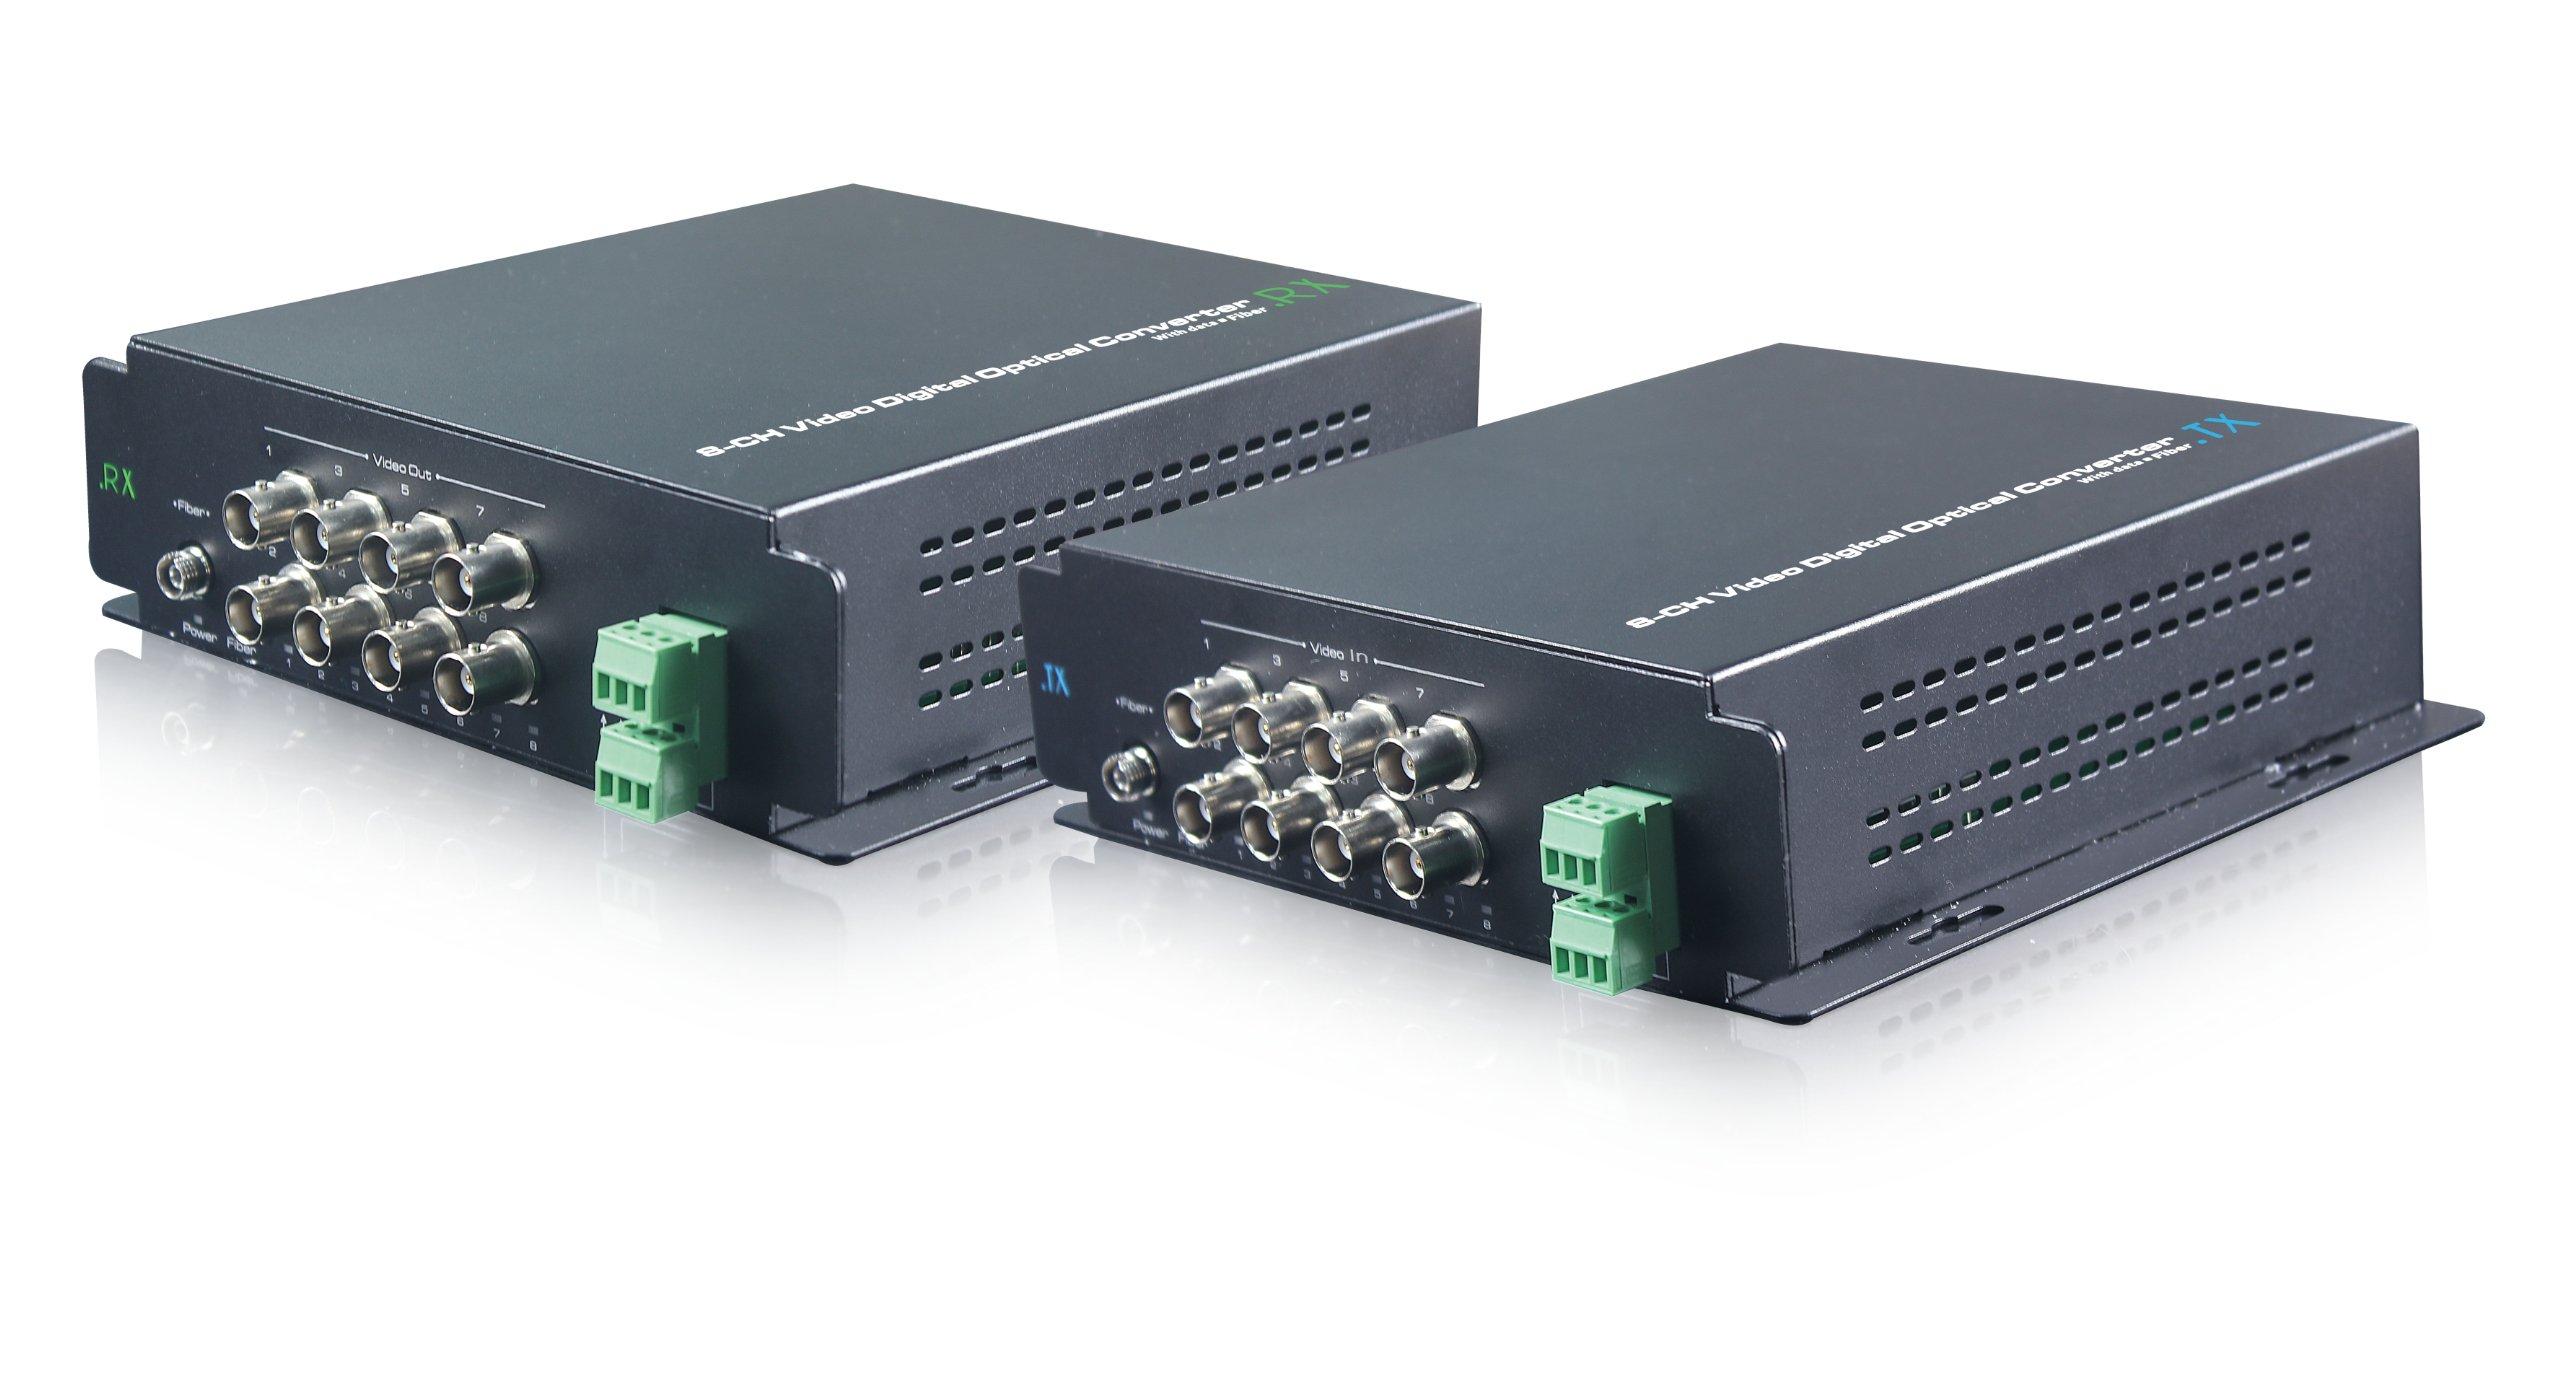 UTEPO UOF108VD 8CH Video 1CH Data Video Balun Optical Fiber Media Converter Transceiver Extender Multiplexer for CCTV Camera (Black)